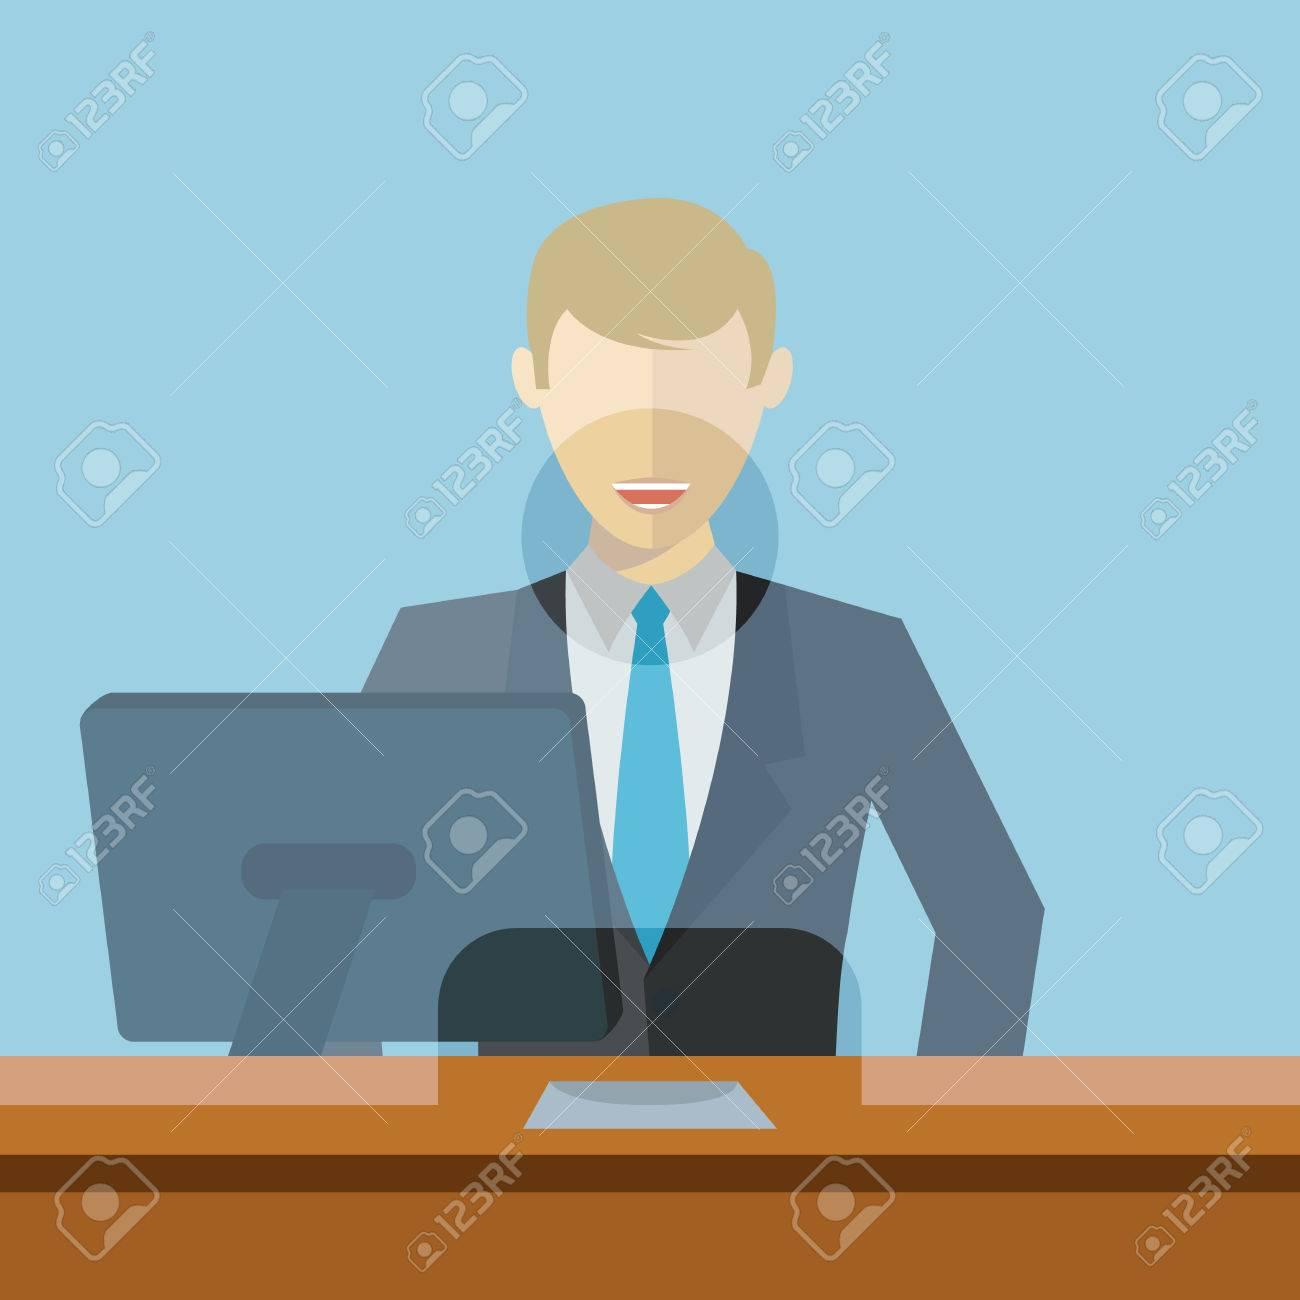 Man Working As Bank Clerk Bank Teller Workplace Vector Illustration